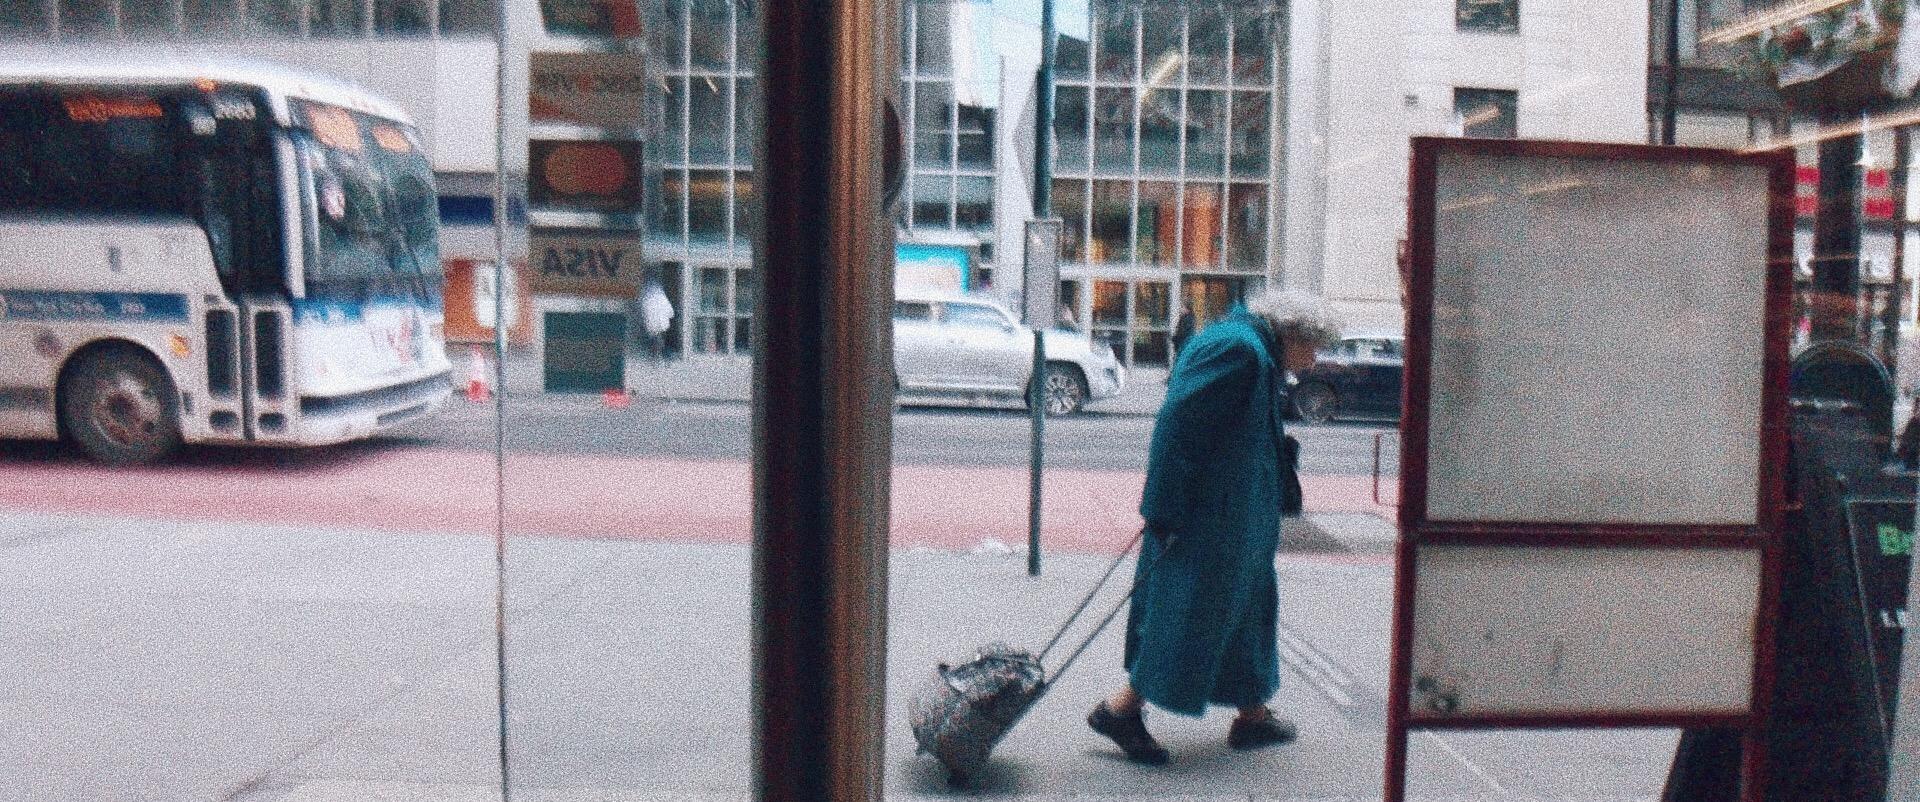 An elderly woman pulling a suitcase through downtown Manhattan.